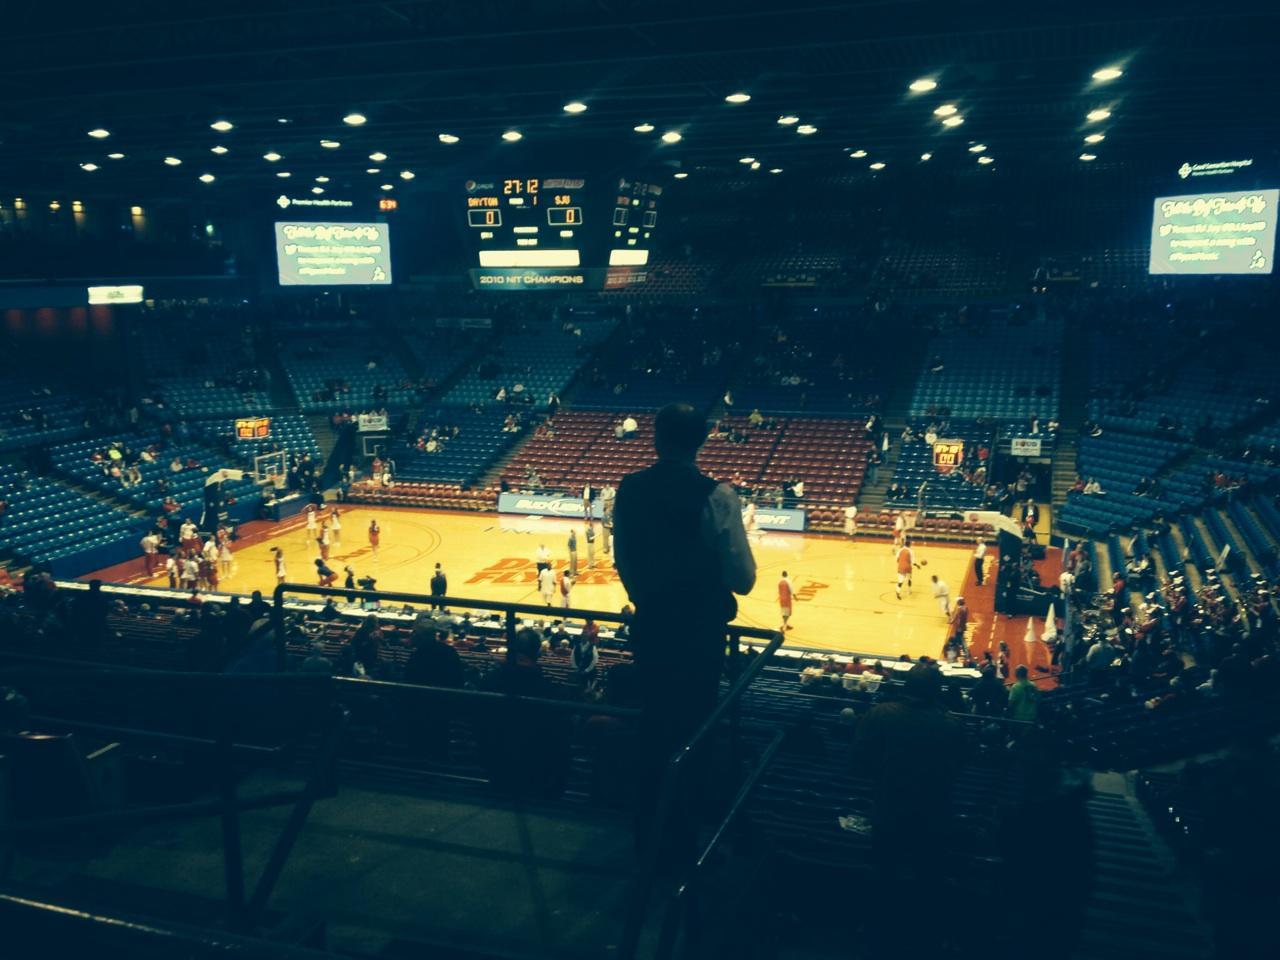 University Of Dayton Arena Section 309 Row F Seat 12